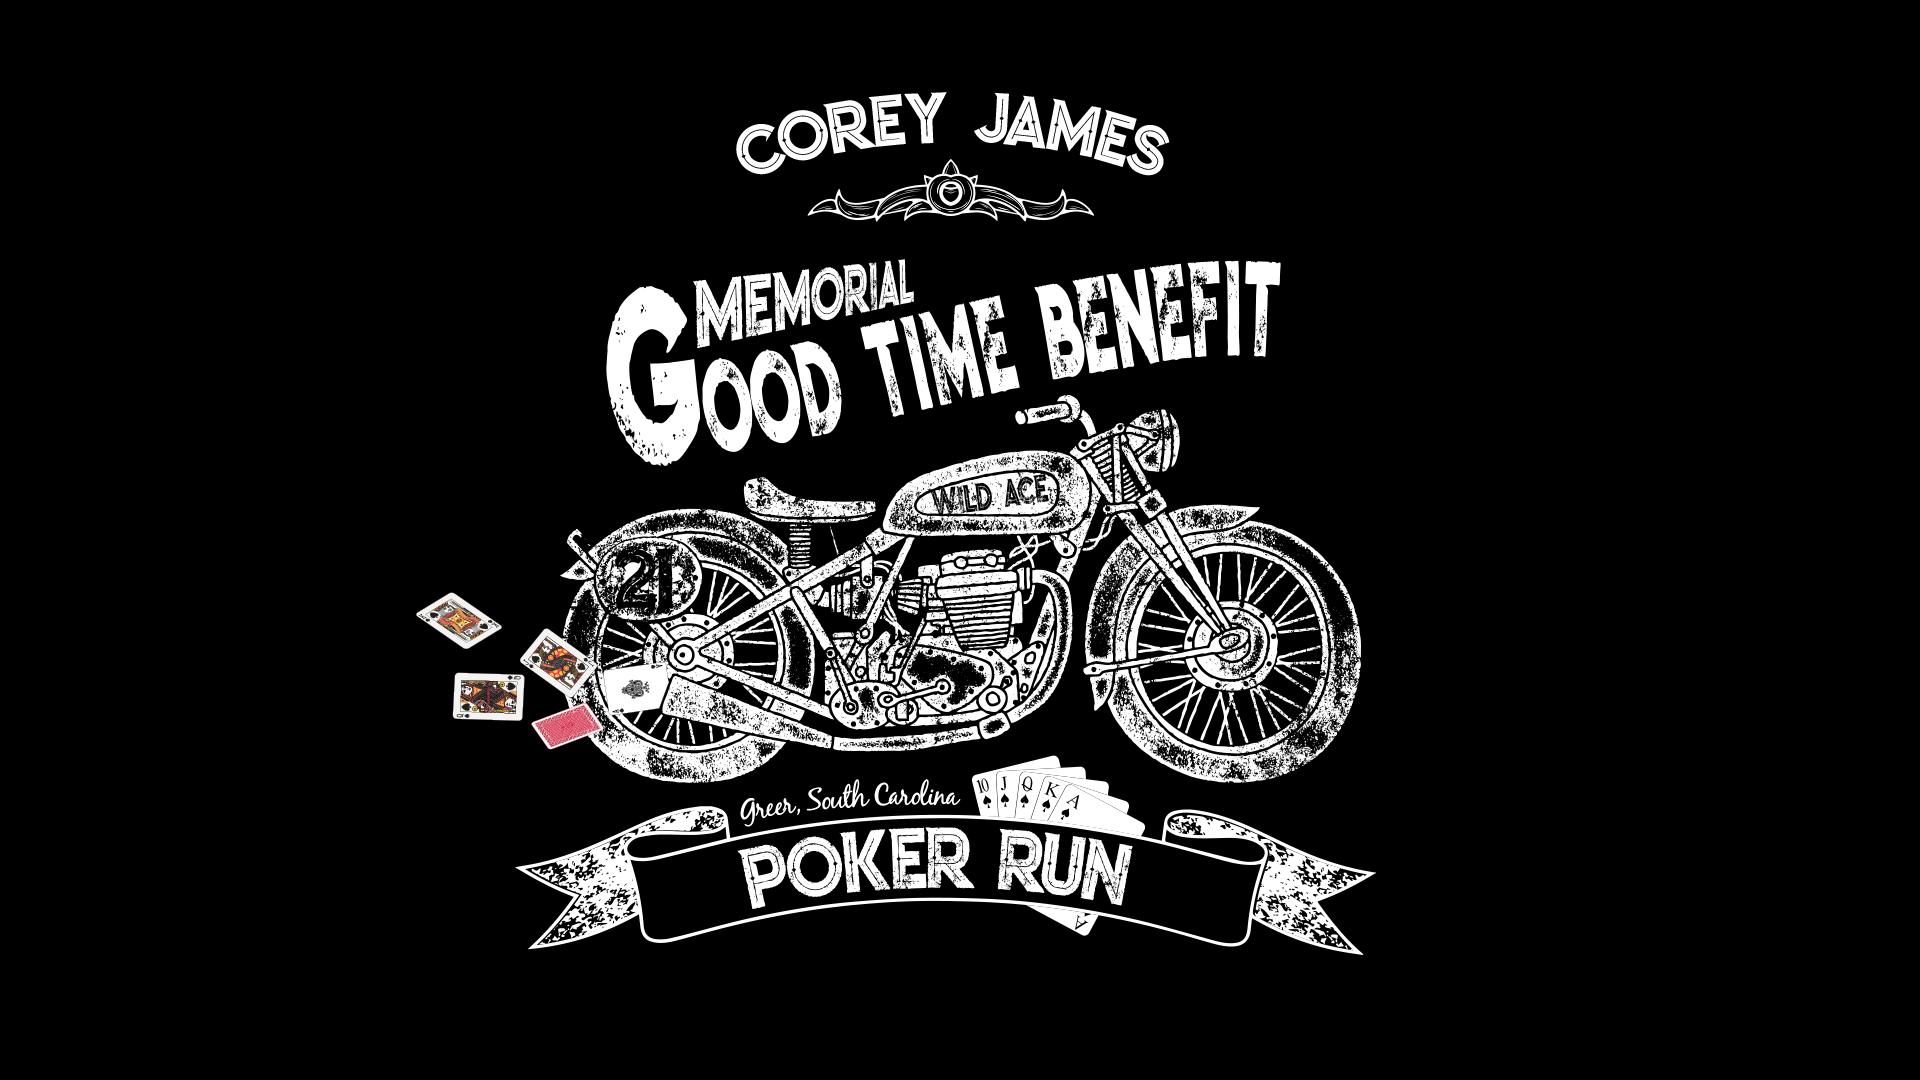 Poker Run Corey James Benefit